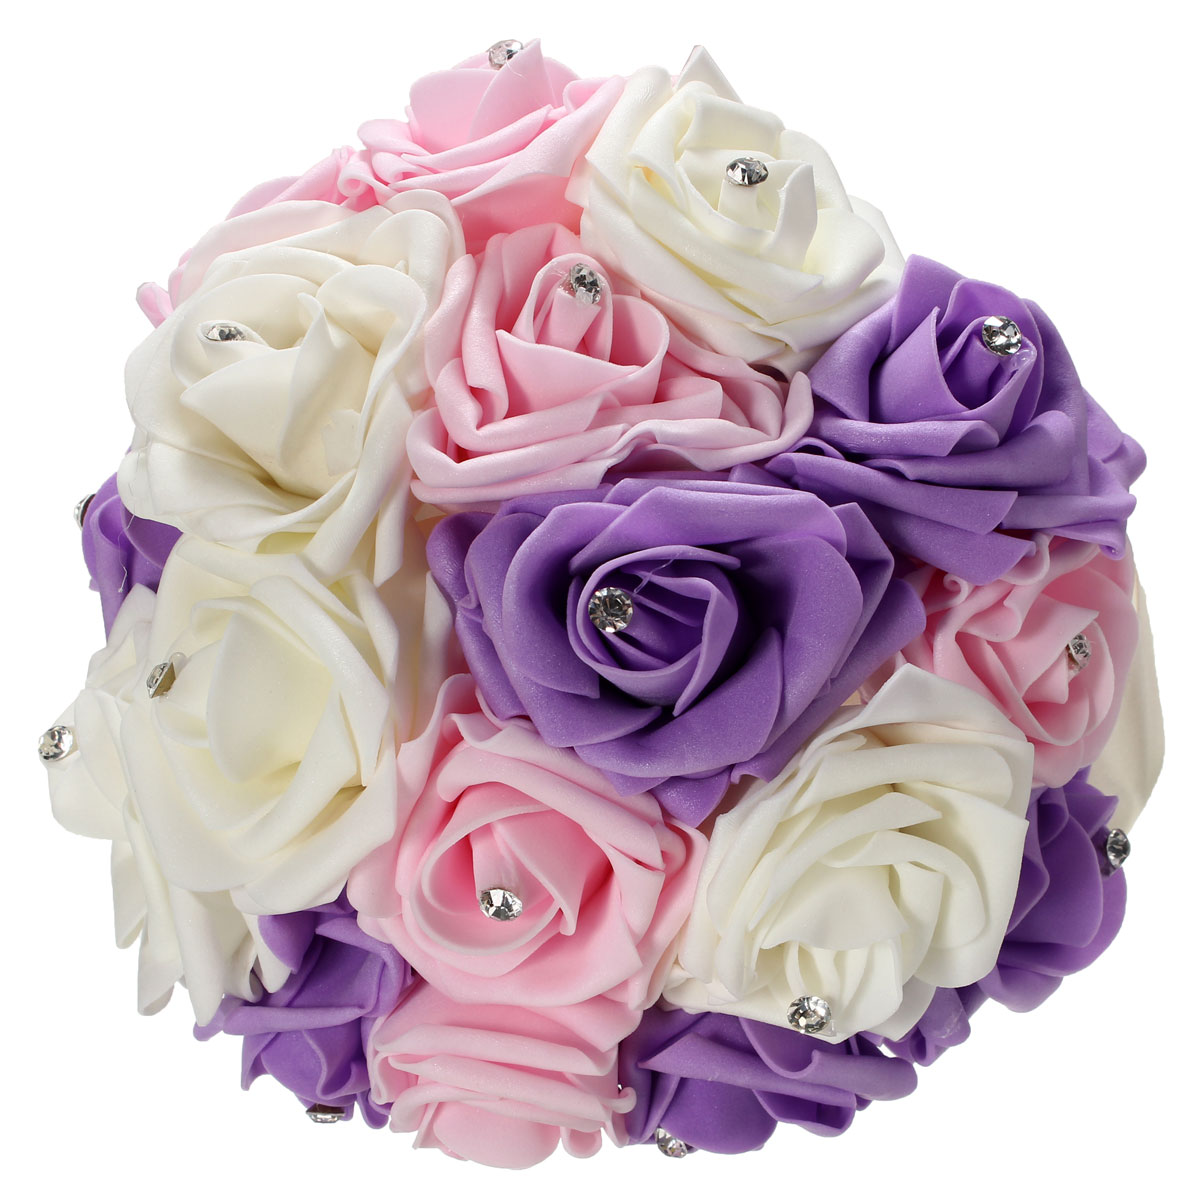 30 pcs Foam Roses Artificial Wedding Flower Ball Bride Bridesmaid ...